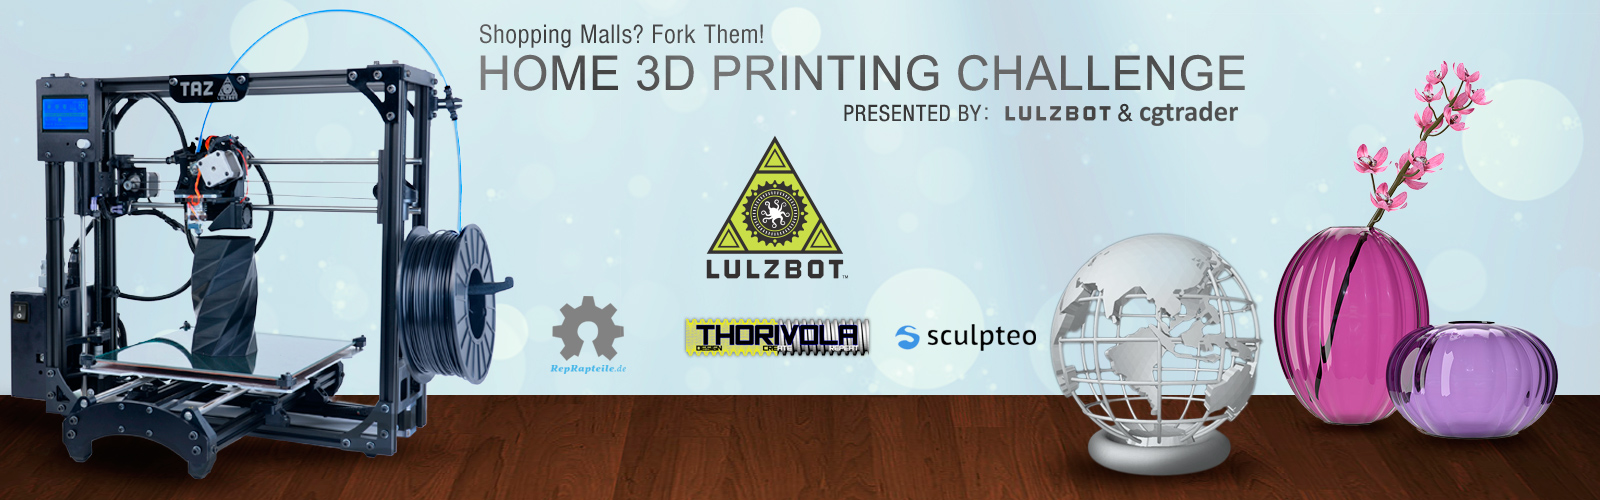 Home 3D Printing Challenge